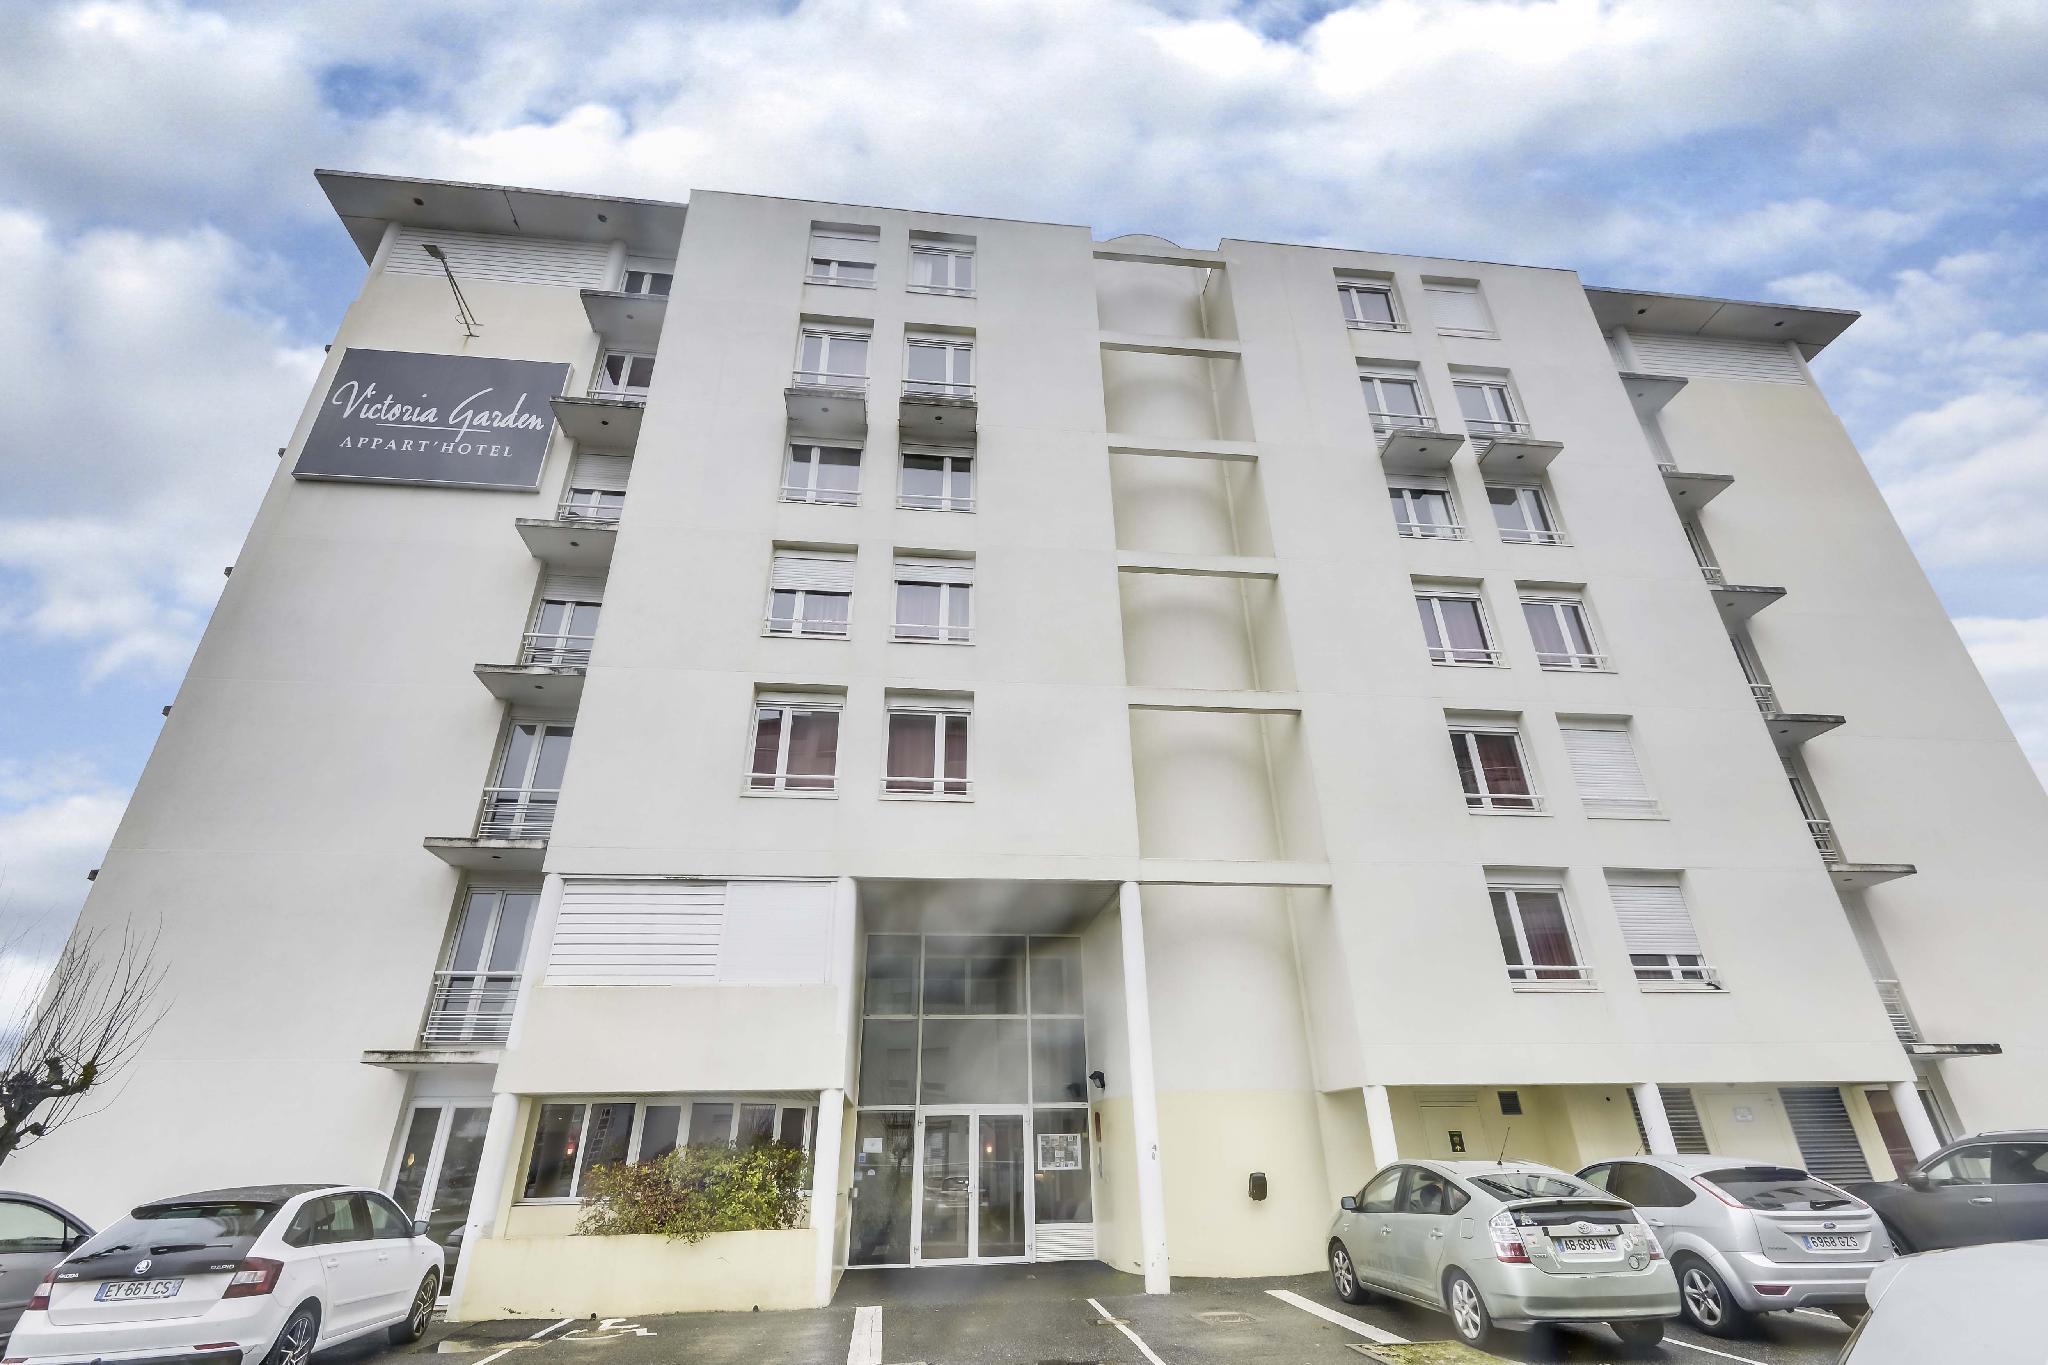 Poterie Goicoechea Pas Cher appart hotel victoria garden pau in france - room deals